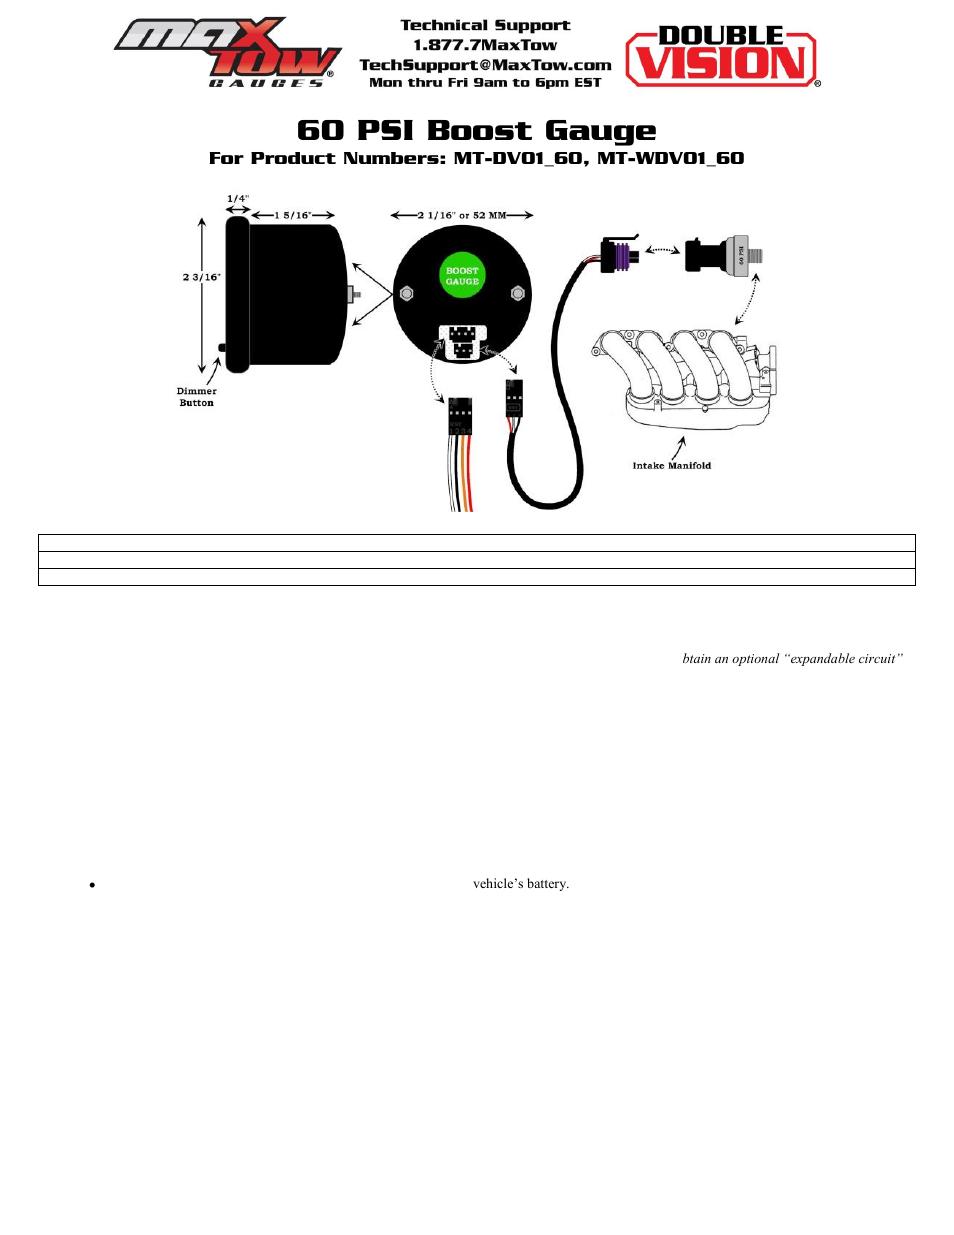 glowshift wire diagram wiring diagram